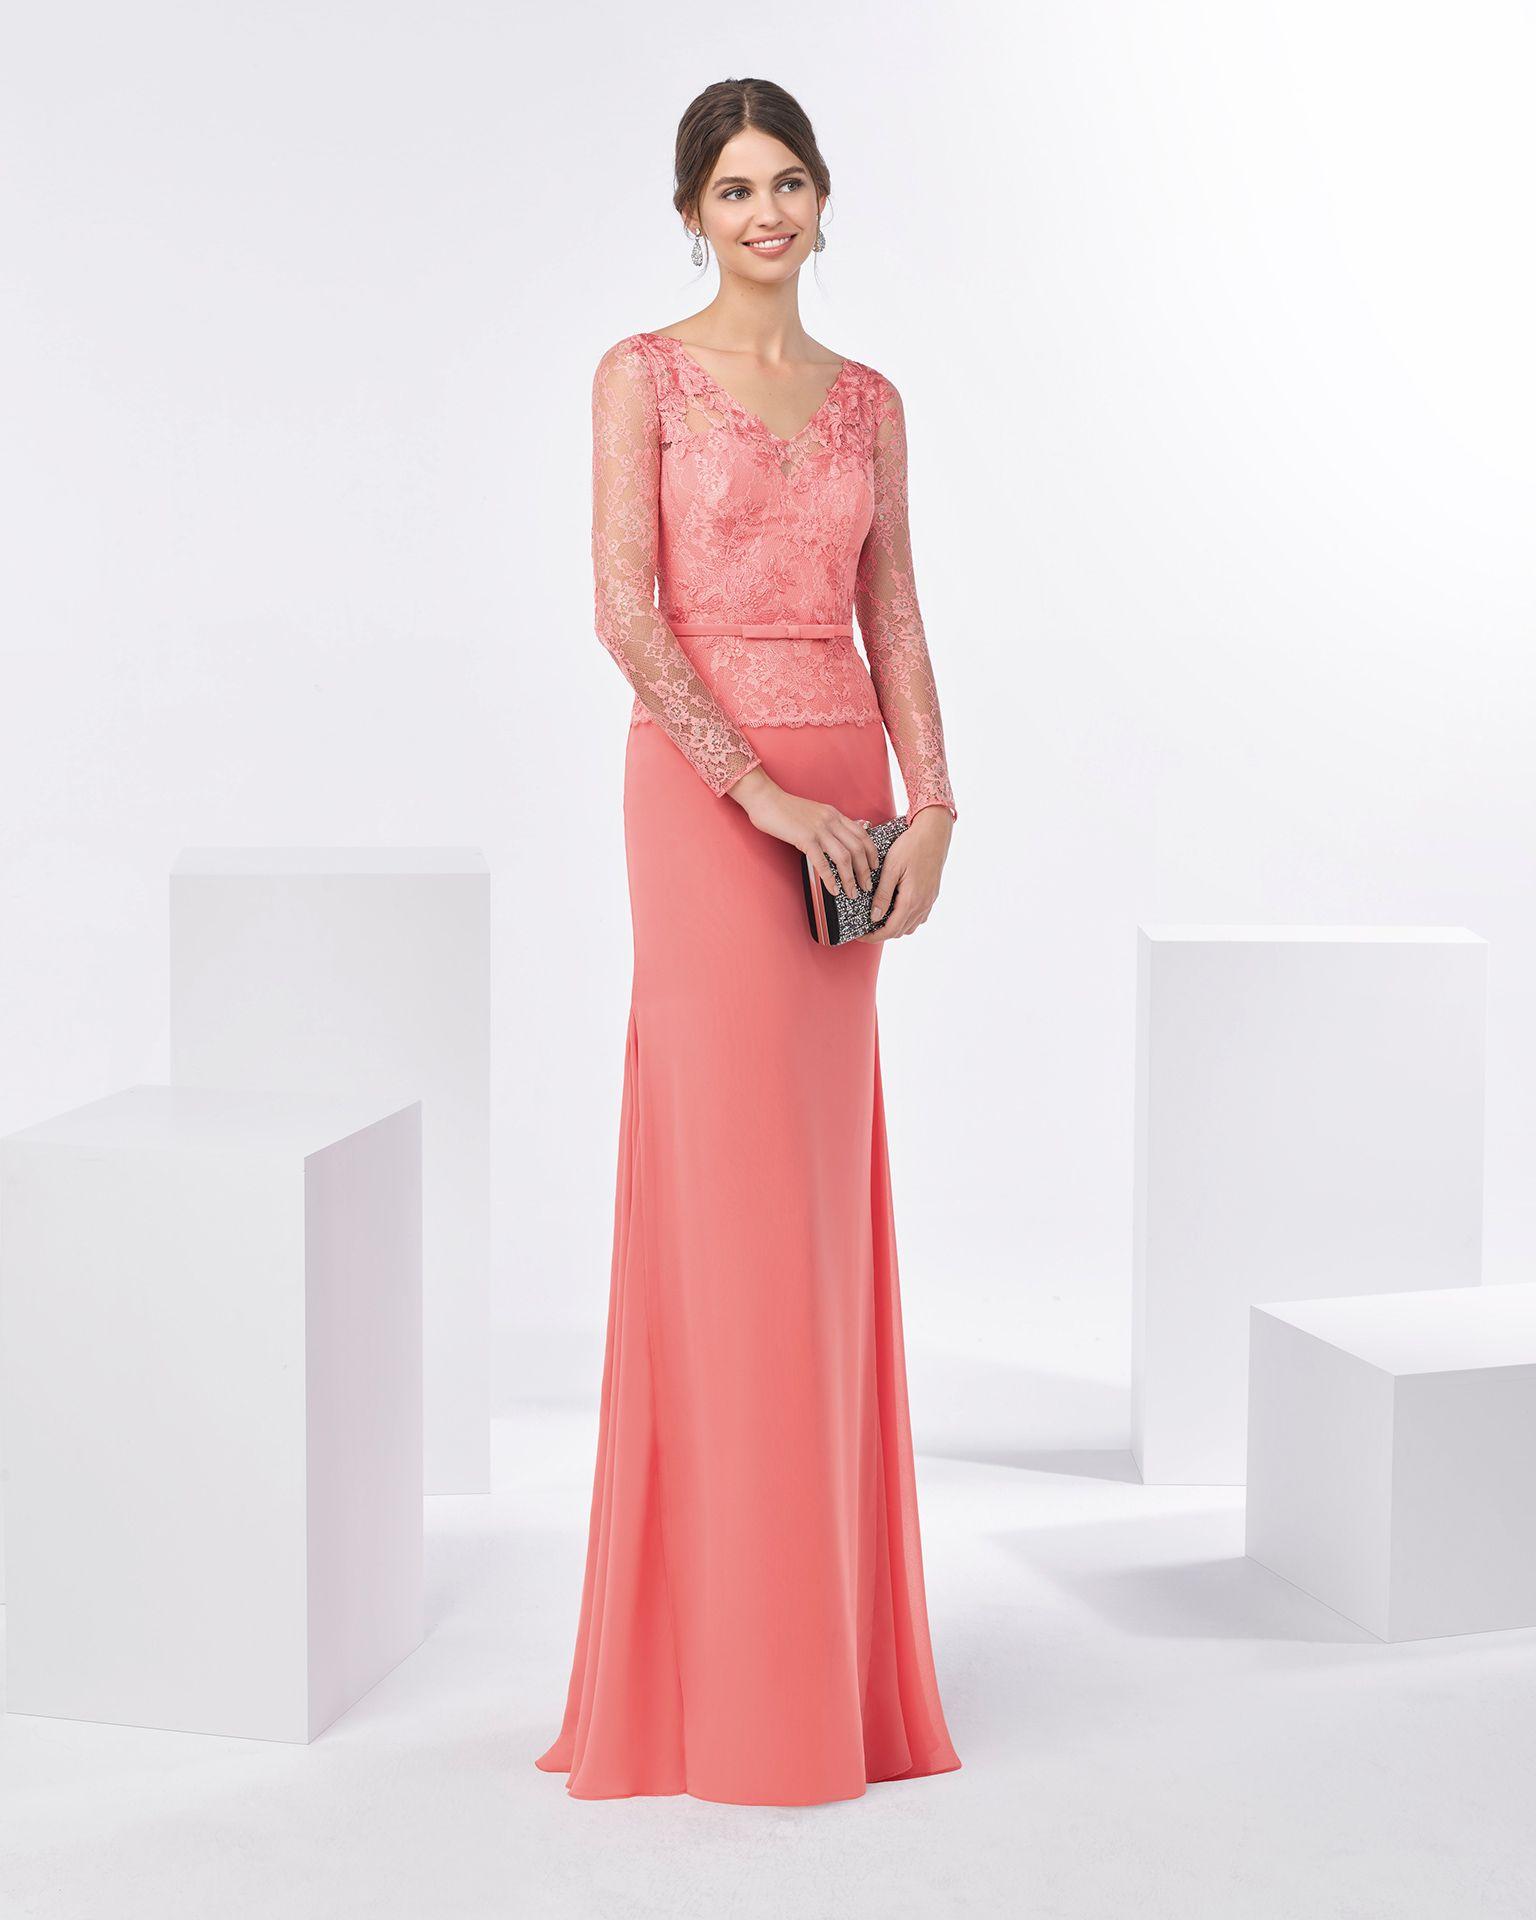 Contemporáneo Lace Long Sleeve Cocktail Dress Embellecimiento ...